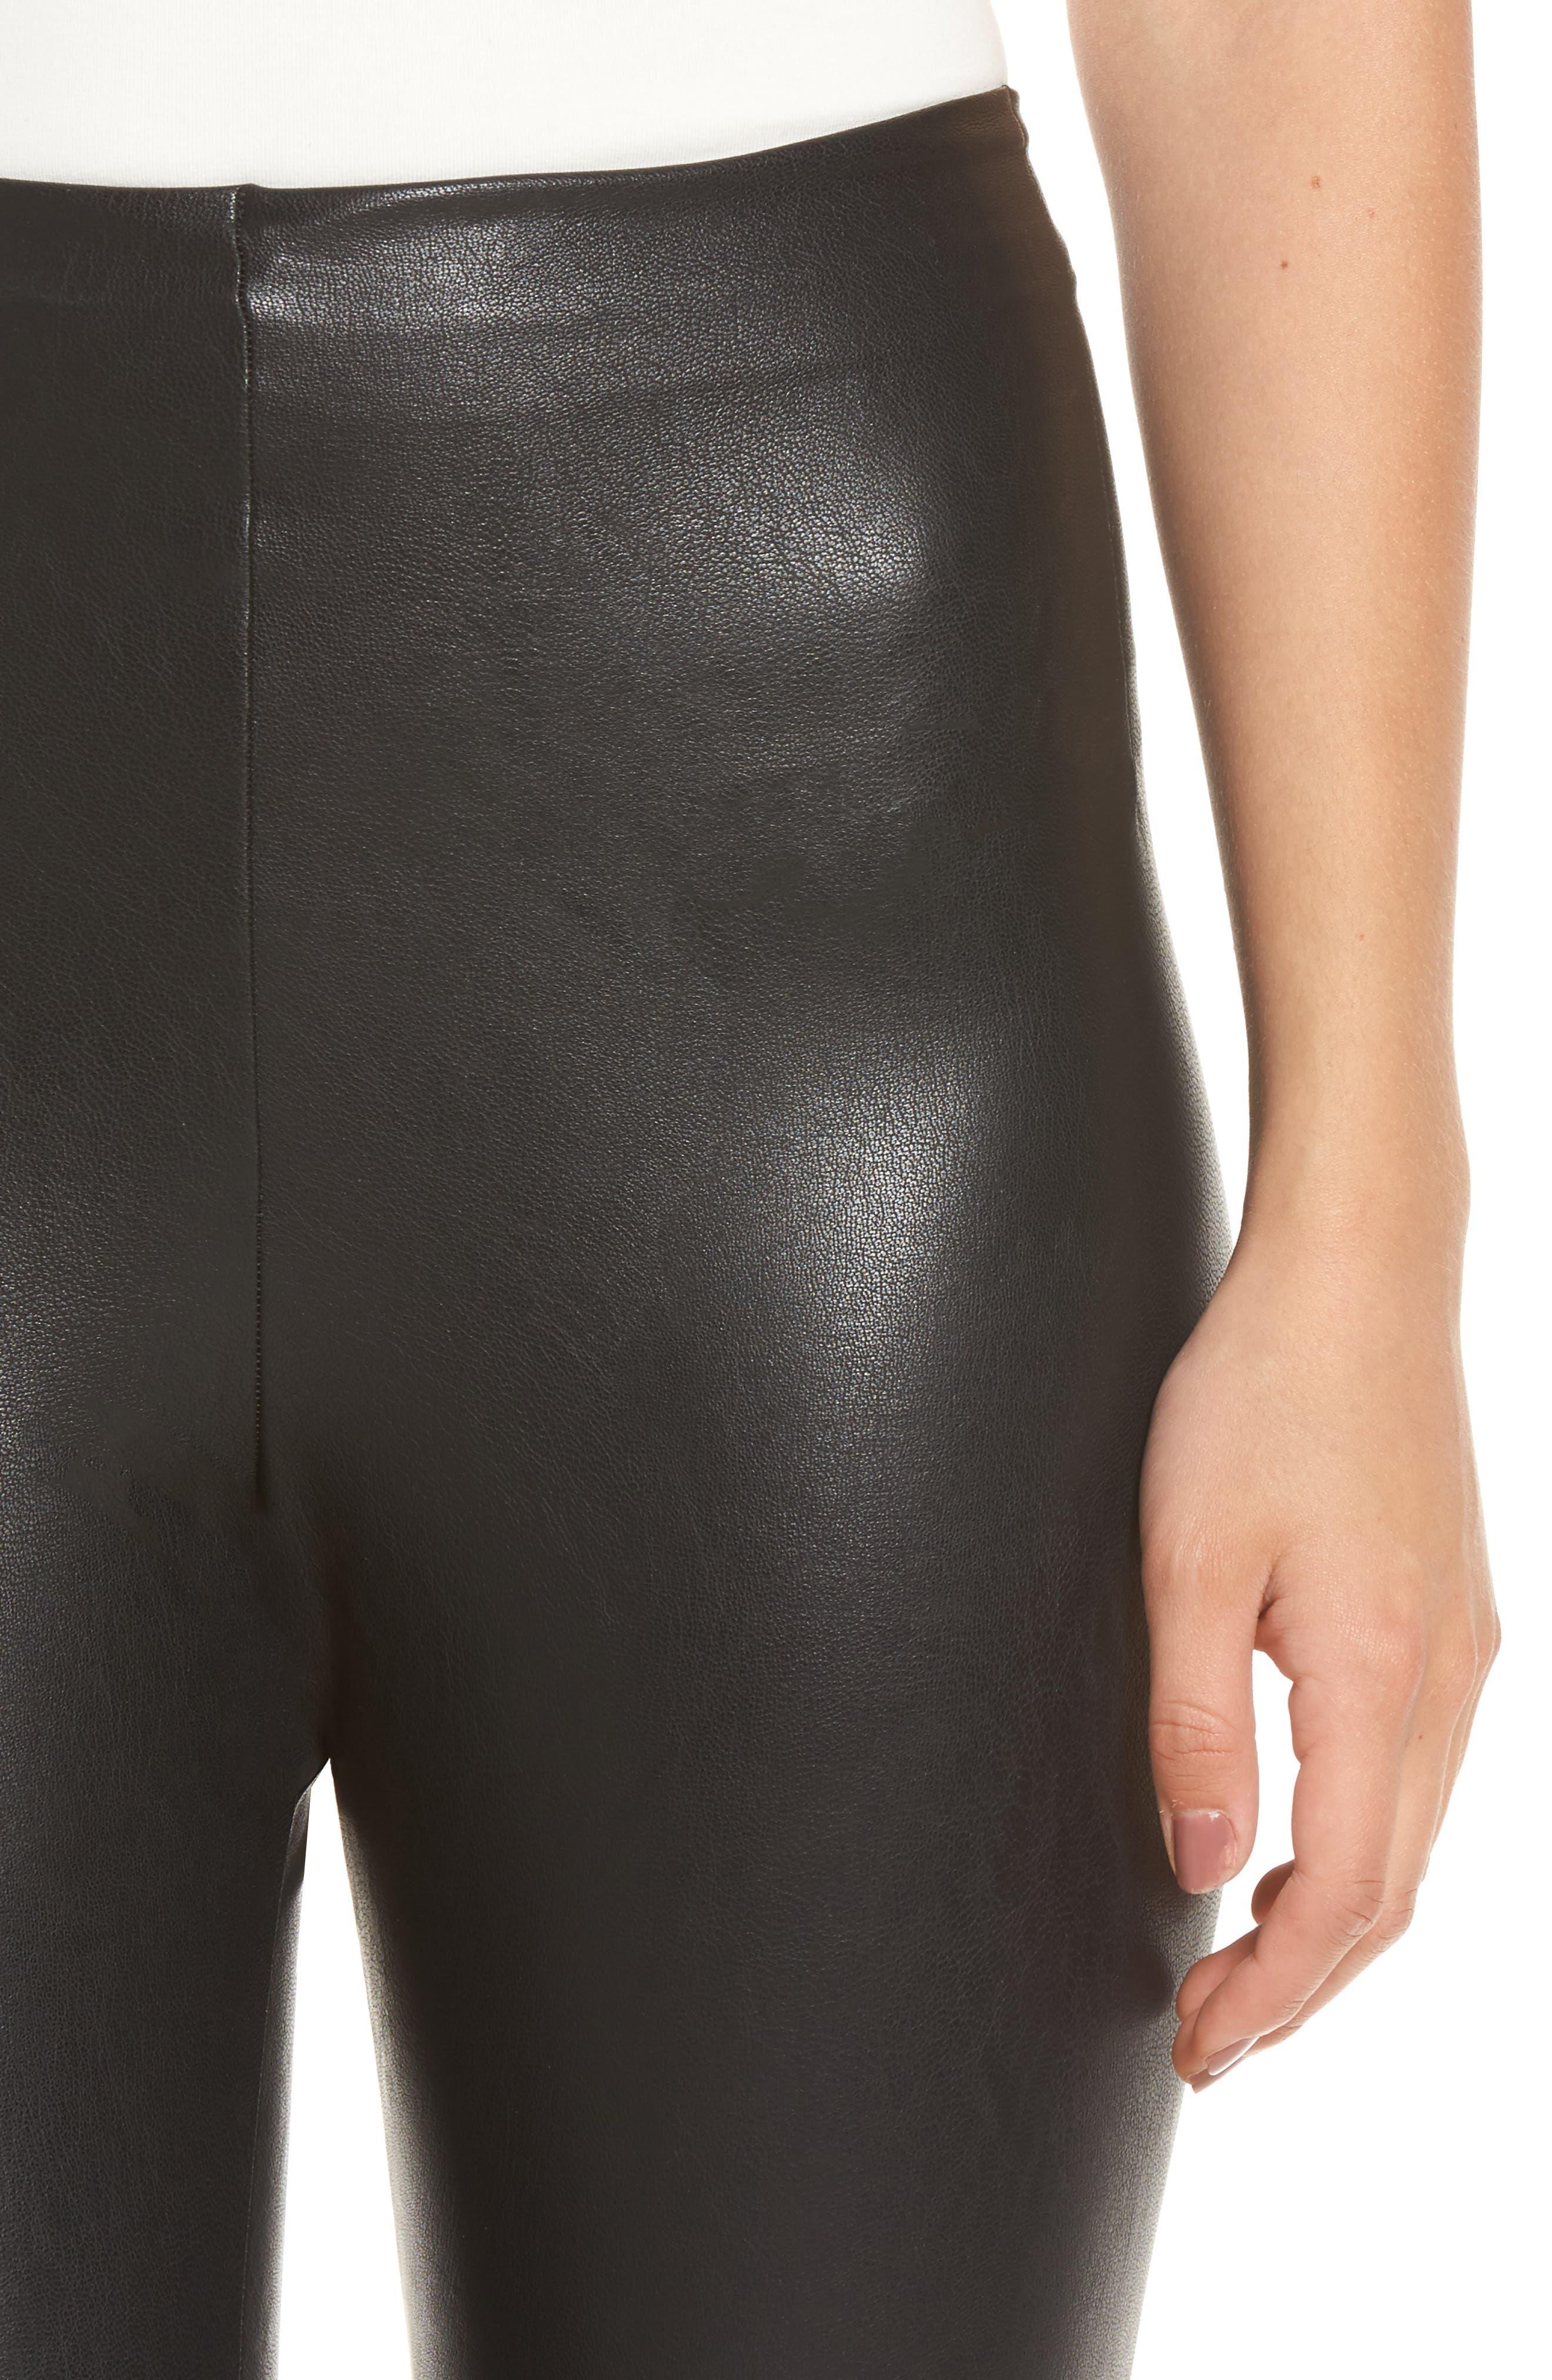 COMMANDO, Perfect Control Faux Leather Leggings, Alternate thumbnail 5, color, BLACK